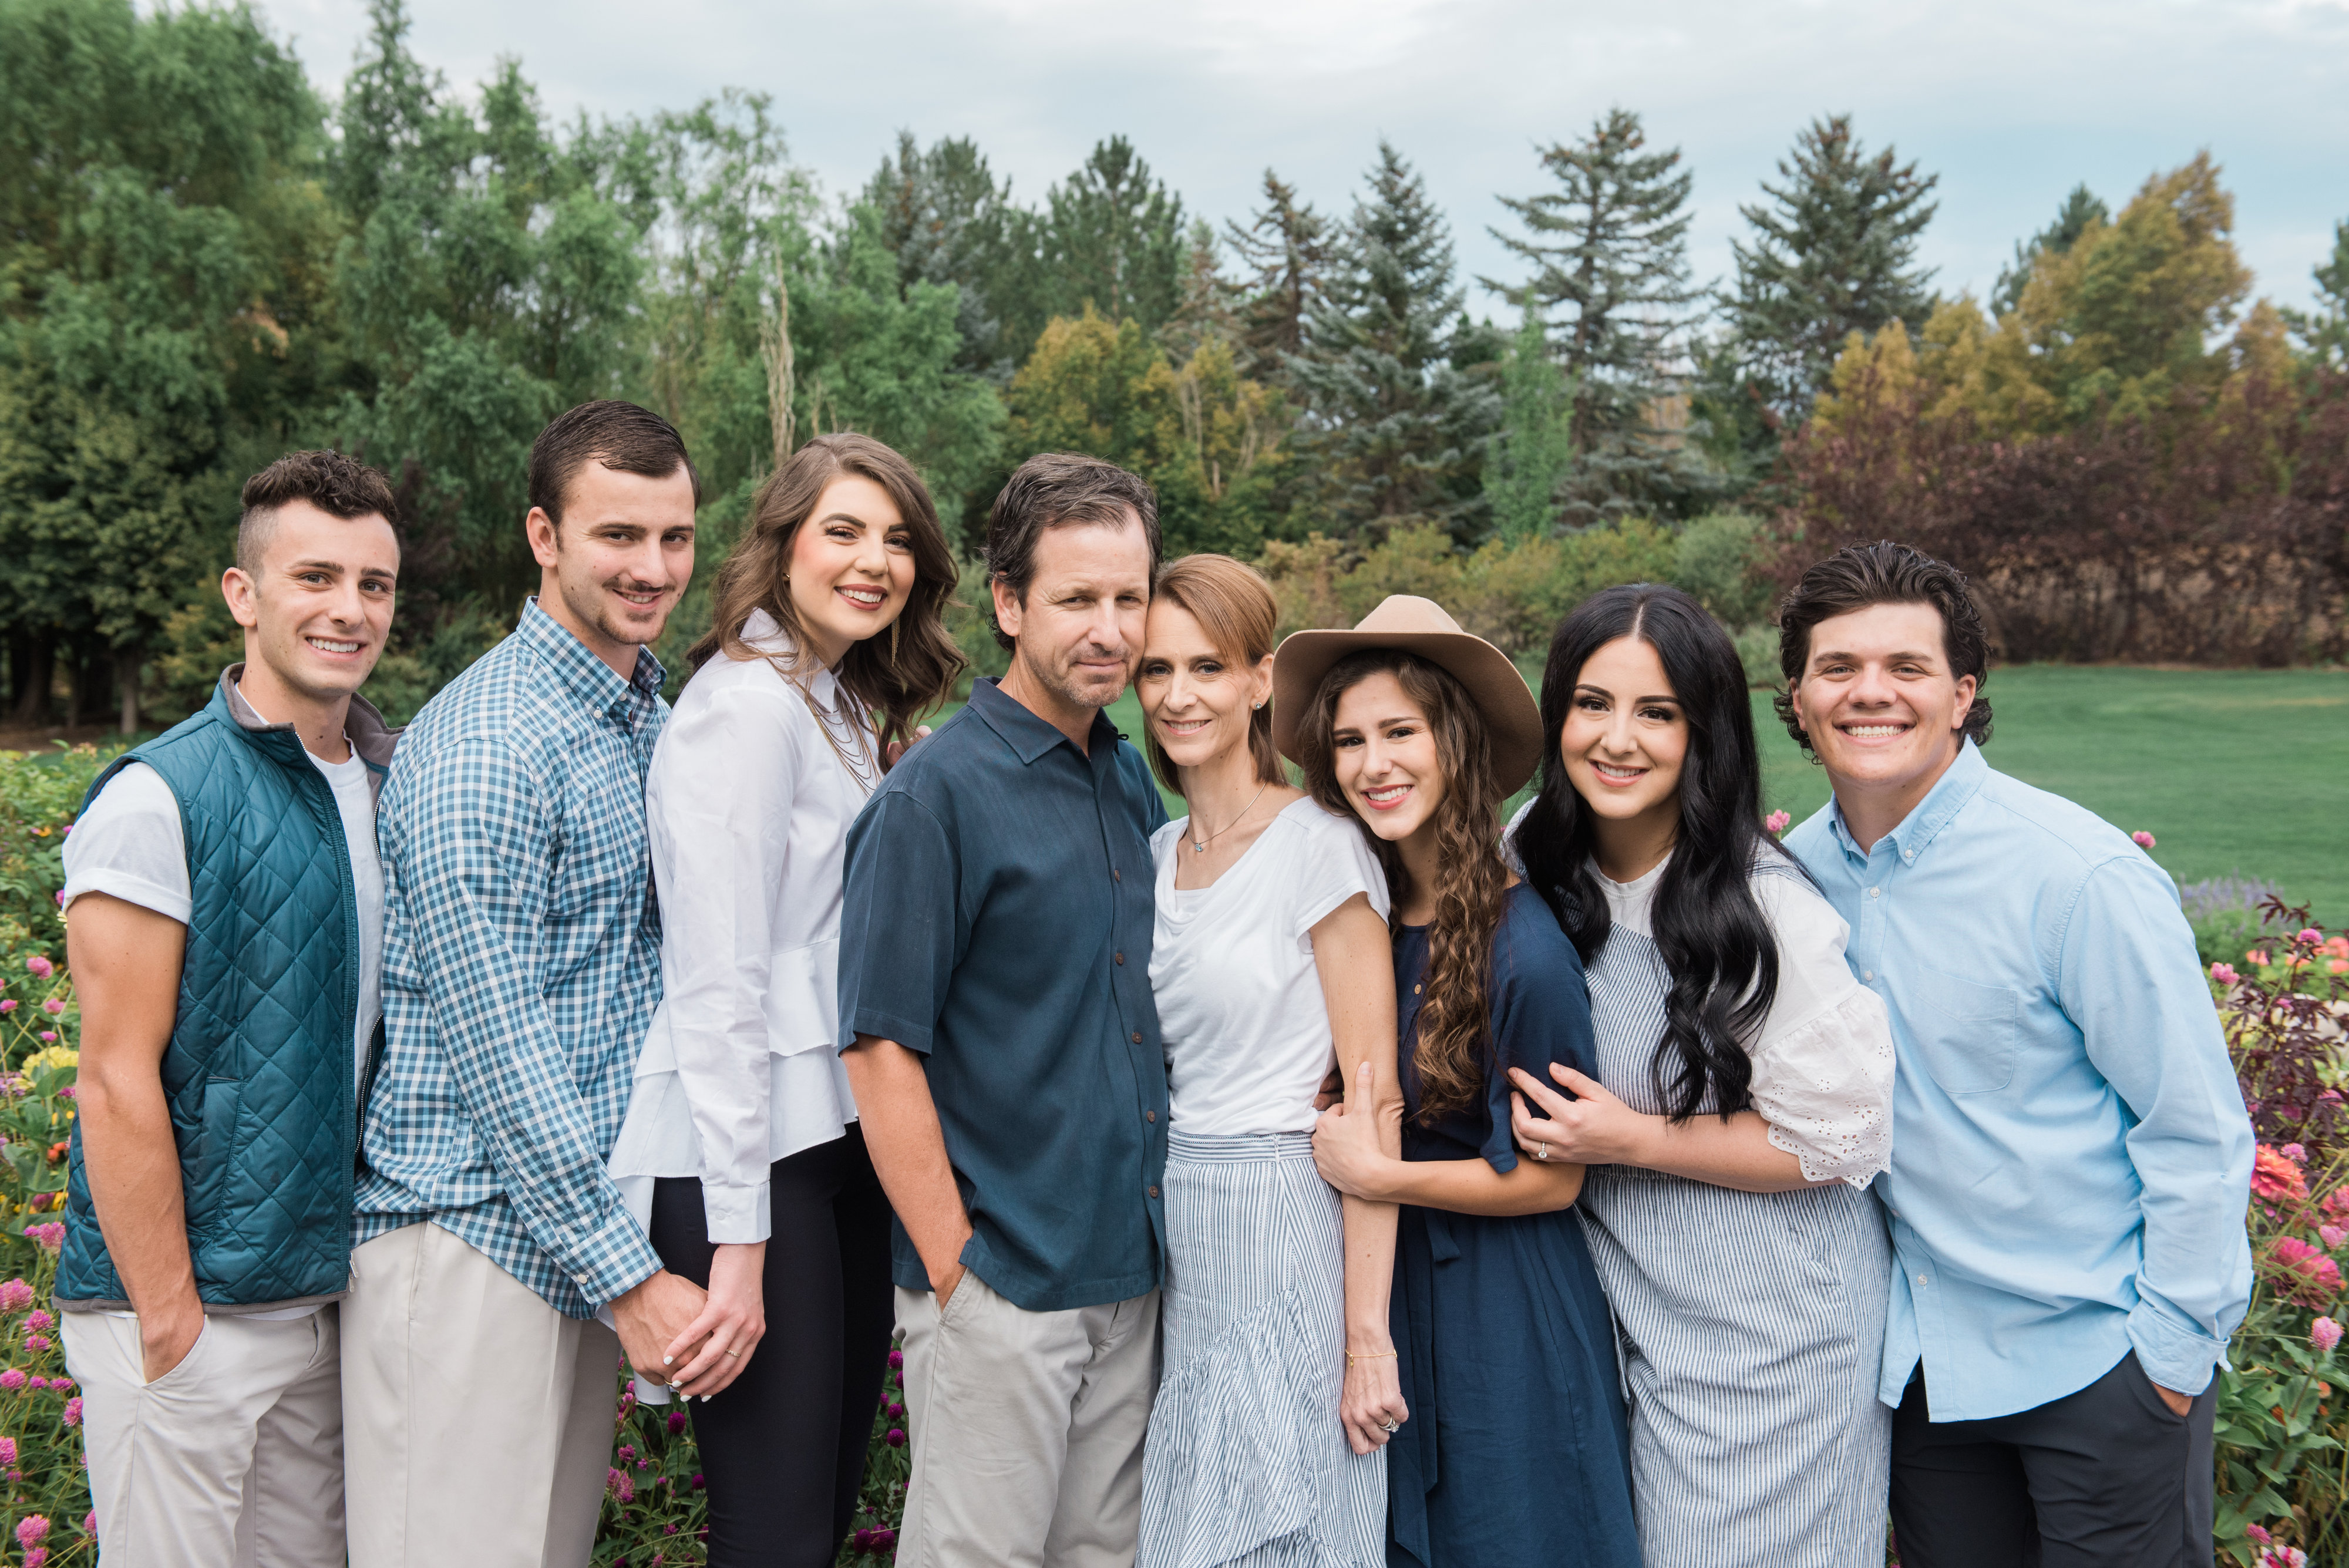 The Ferran family left to right: Parker Ferran, Bronson Ferran, Andrea Ferran, Troy Ferran, Annette Ferran, Alexa Ferran, Ashley Sylvester, Zachary Sylvester.